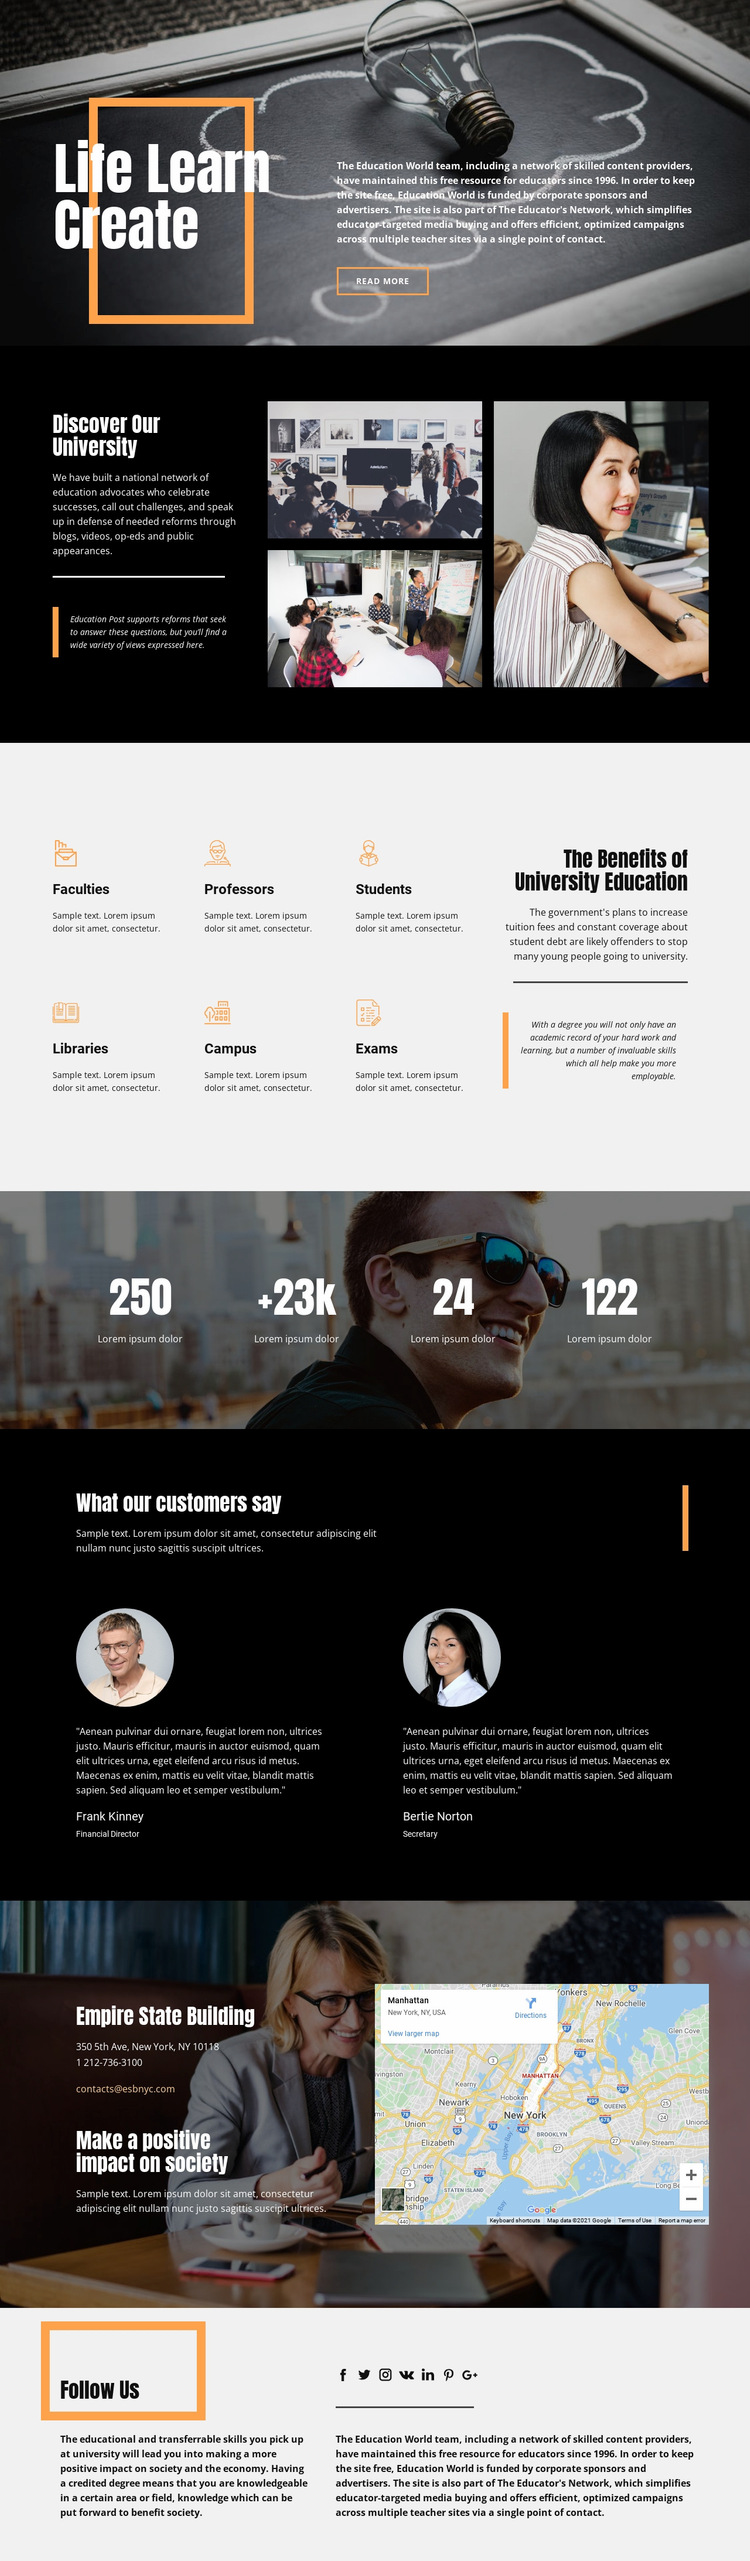 Discover highs of education Website Builder